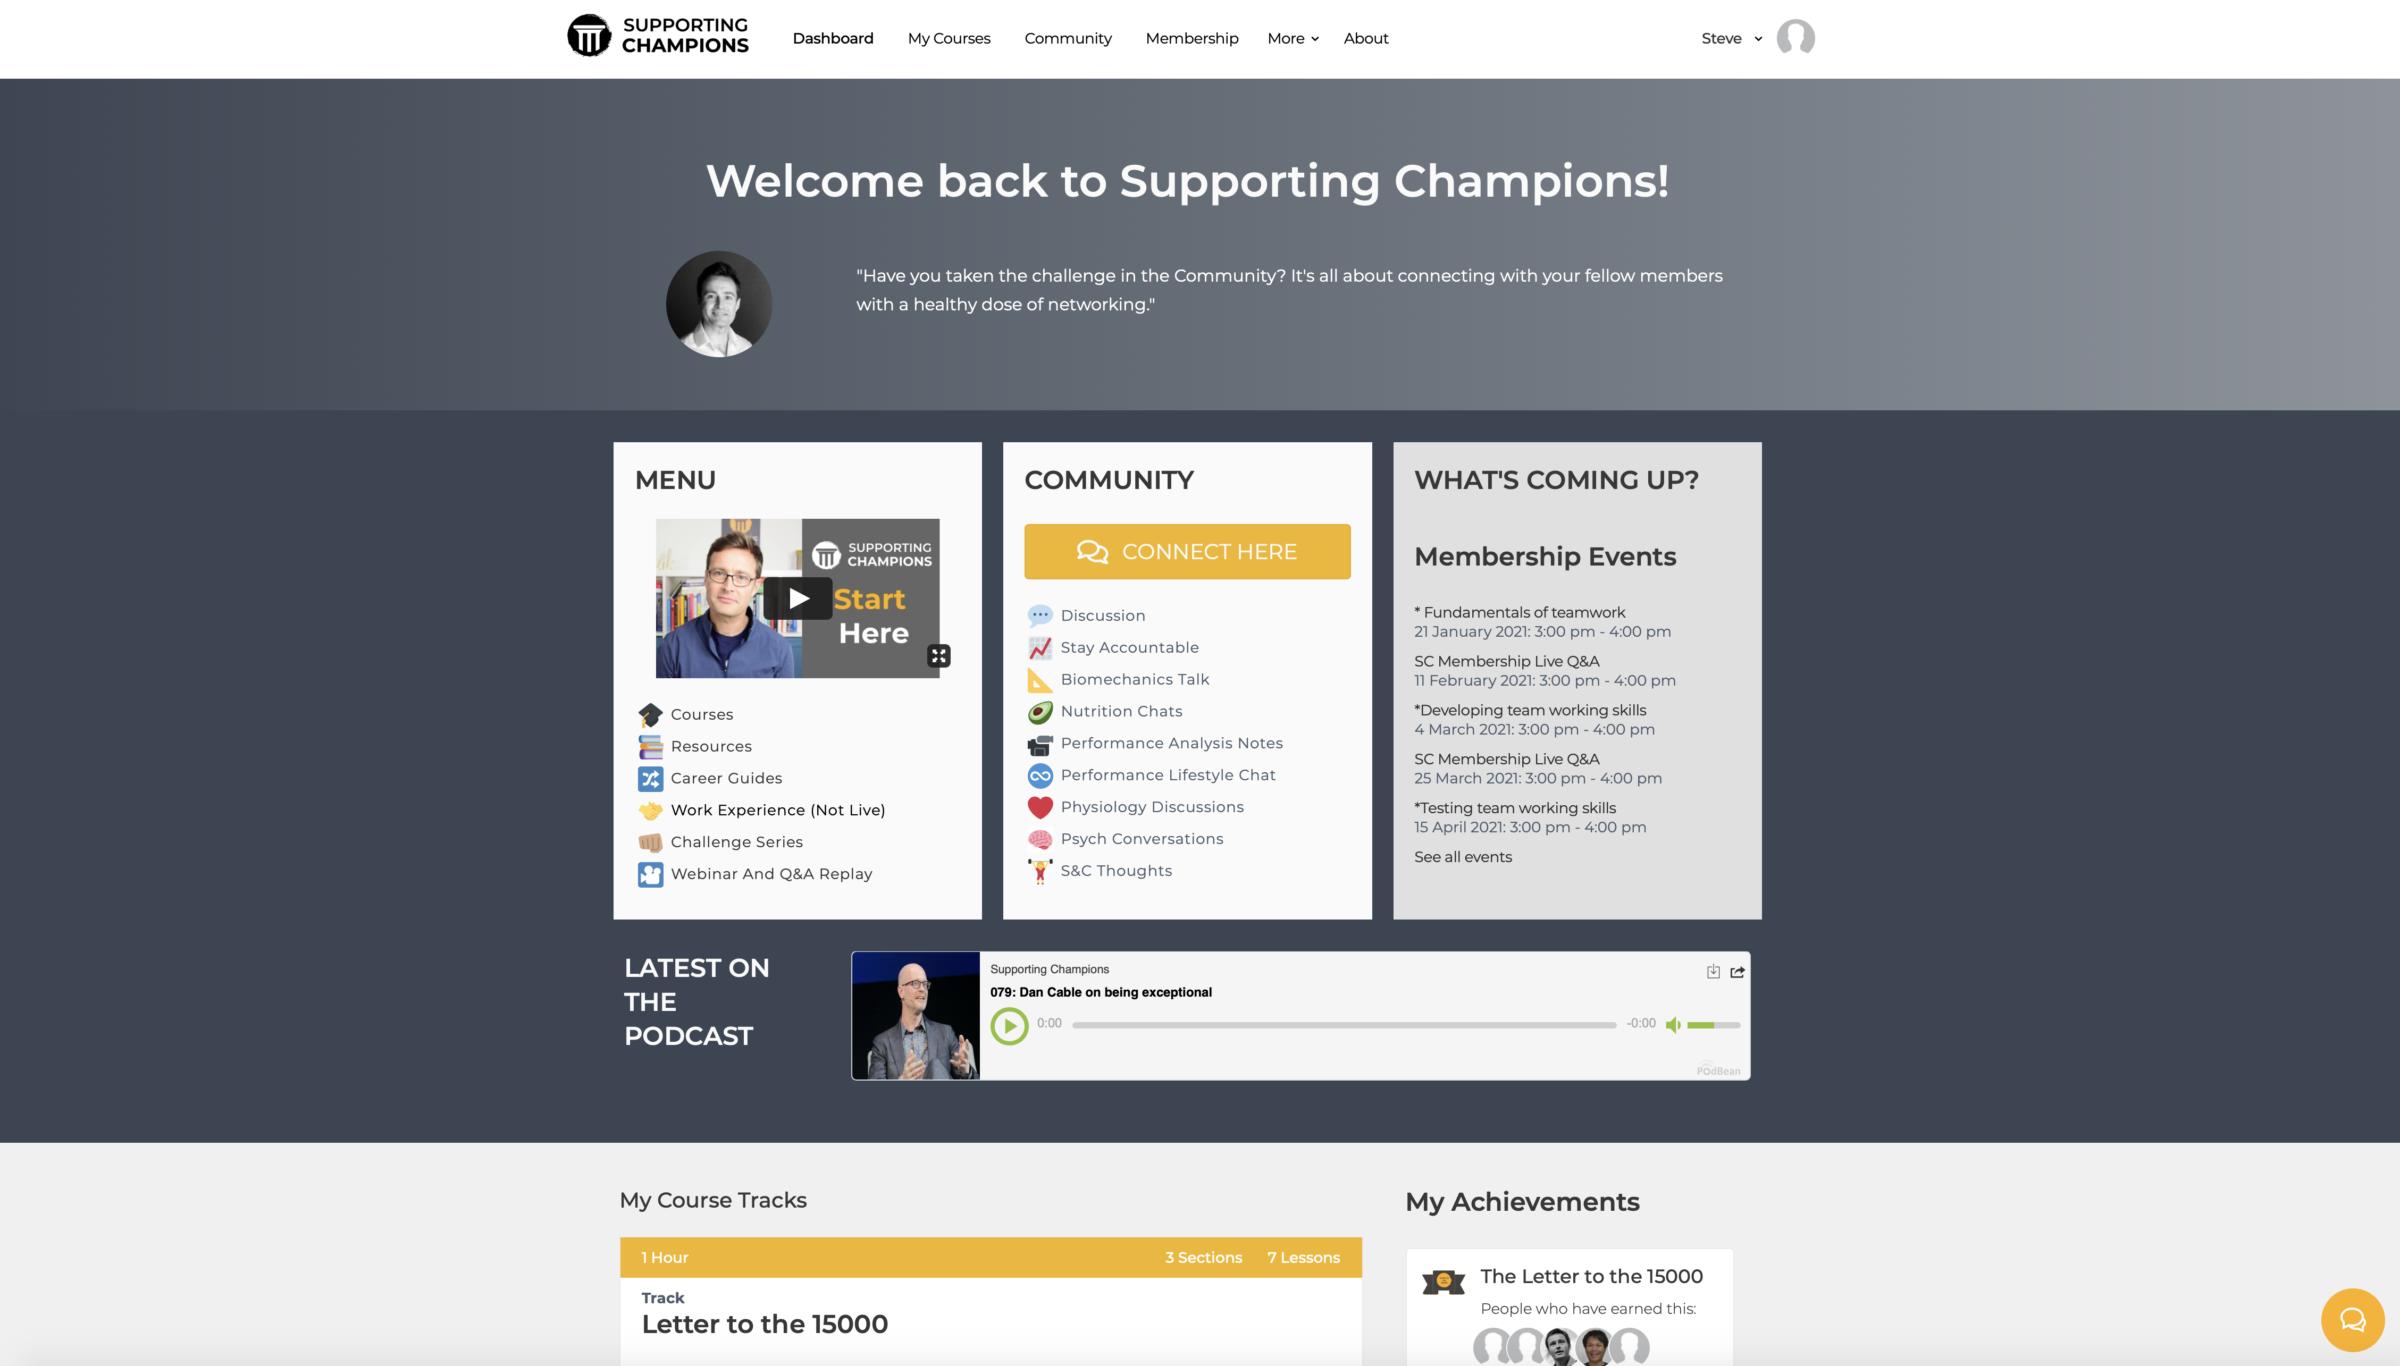 Dashboard main page